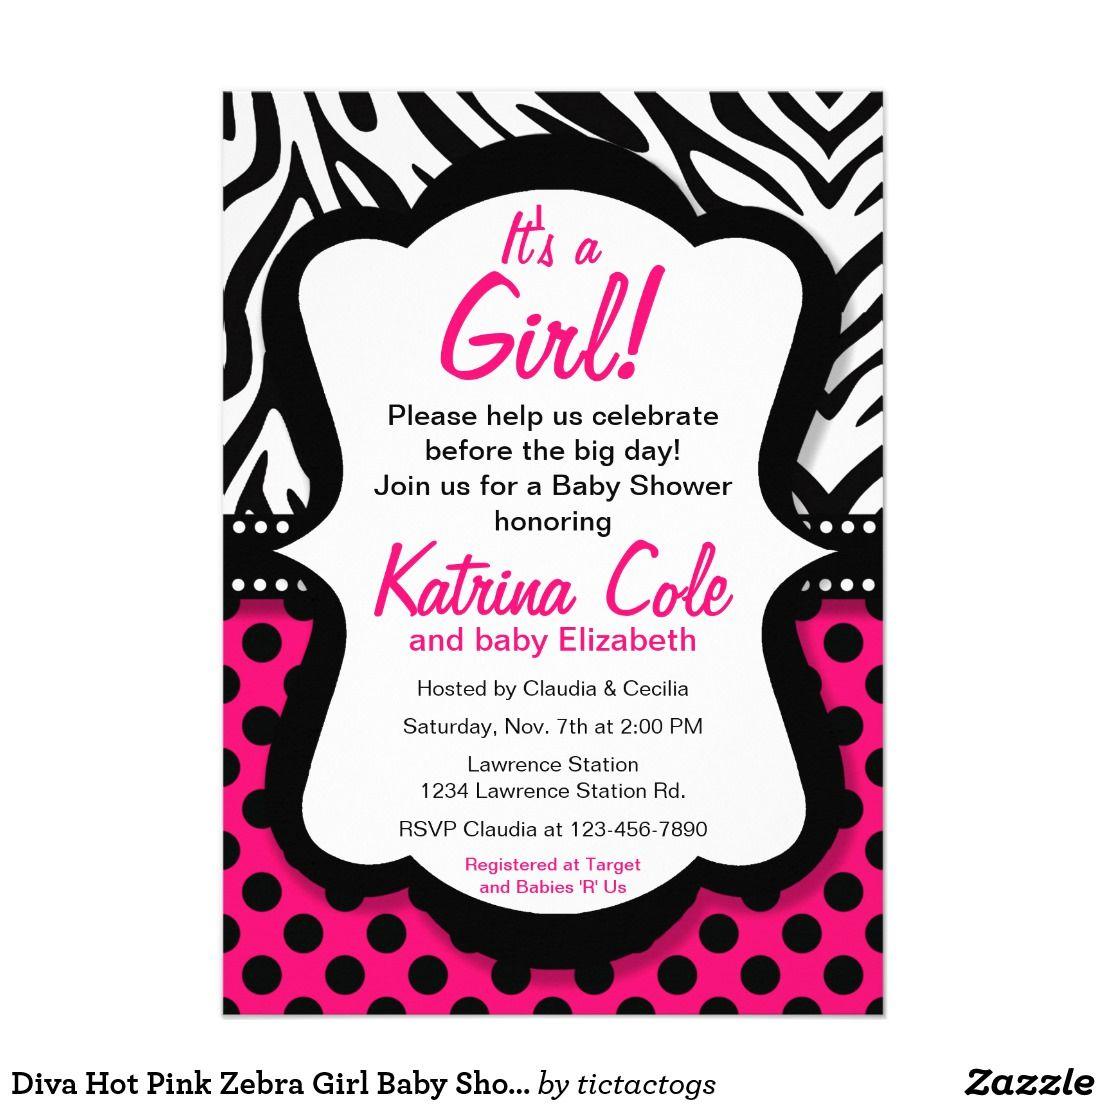 Diva Hot Pink Zebra Girl Baby Shower Invitation | { Oh Baby ...